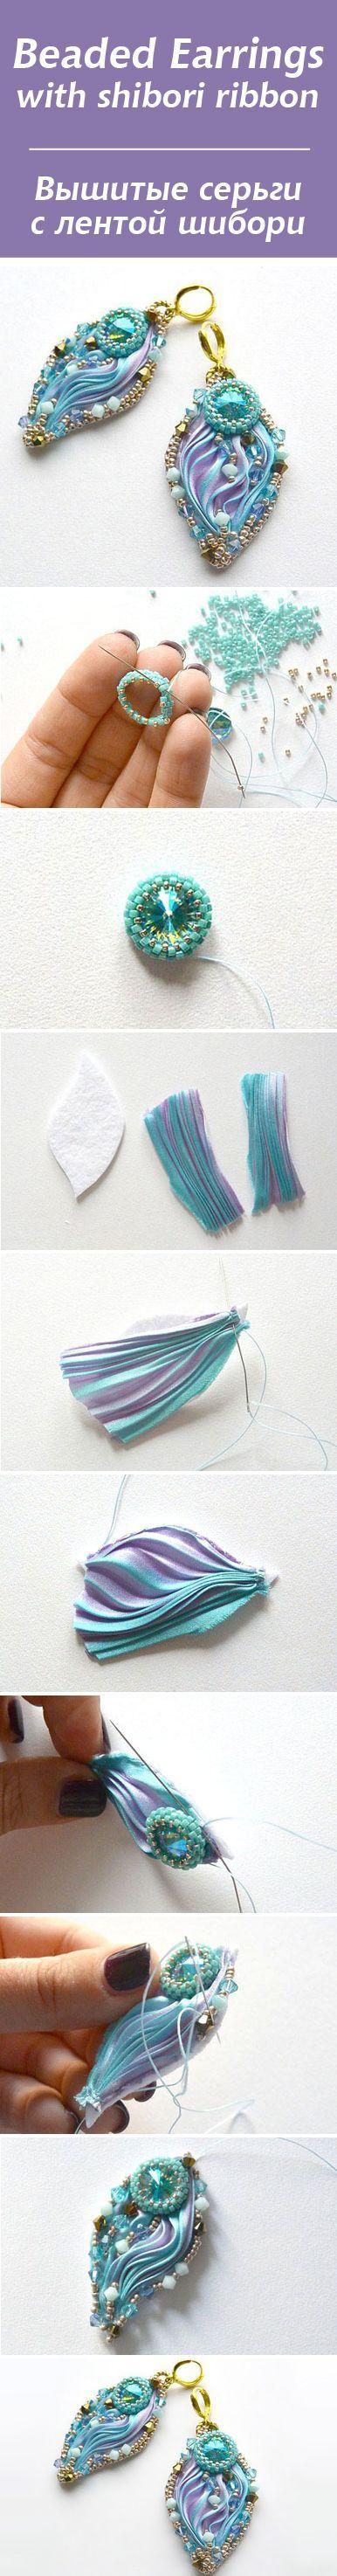 Earrings with Shibori silk ribbon tutorial   Мастер-класс: вышитые серьги с лентой шибори